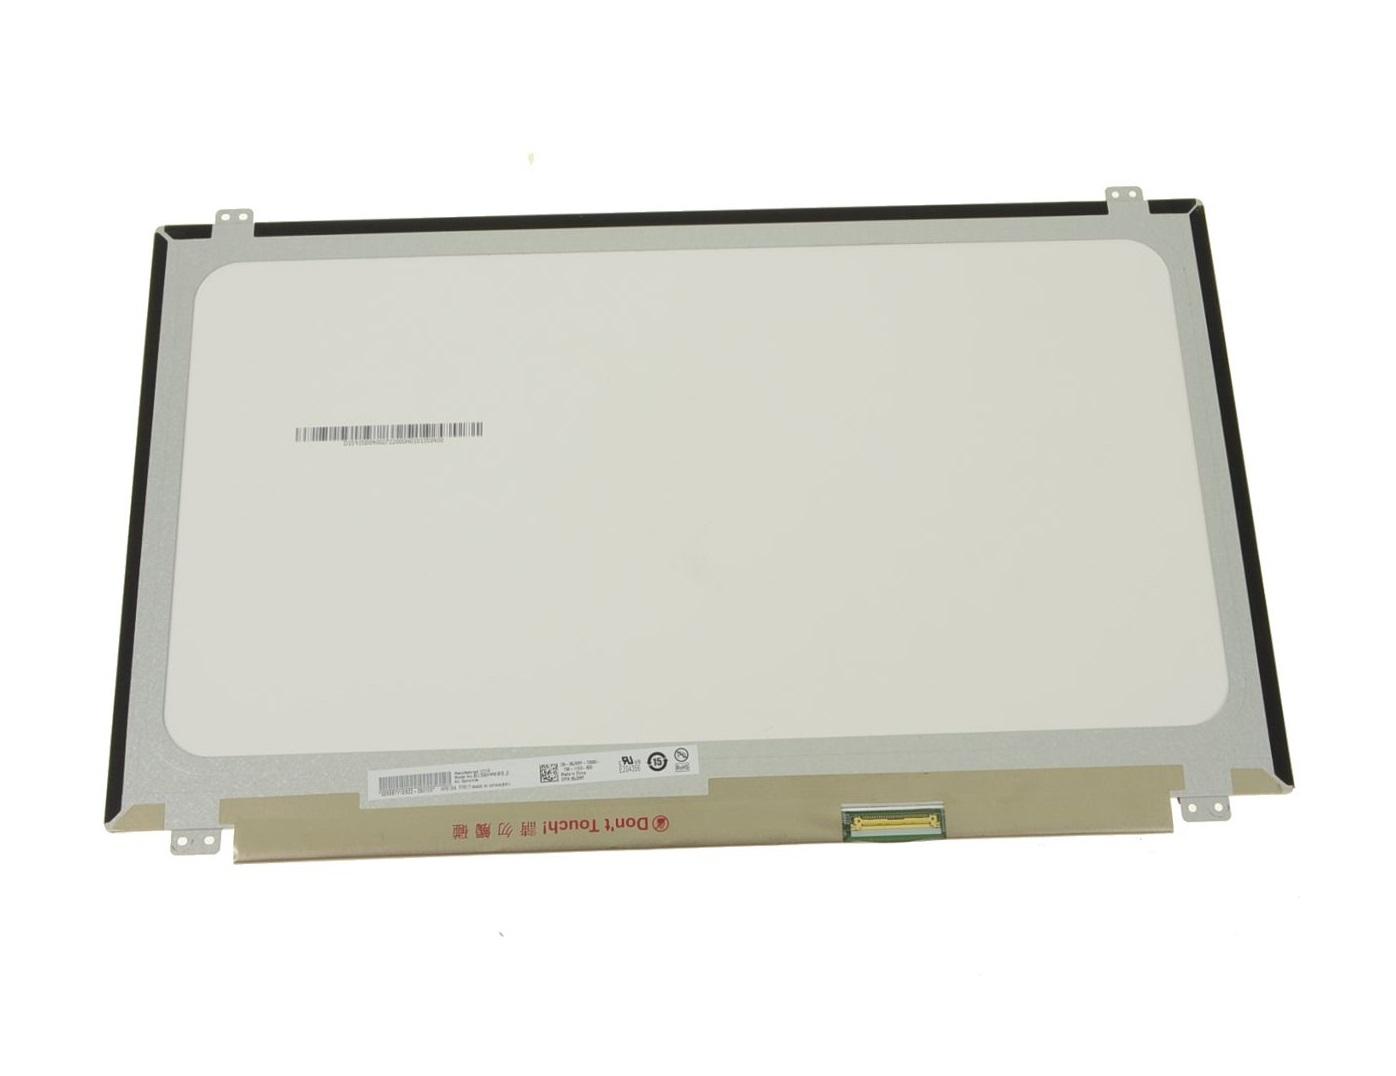 Display original Dell Inspiron 15 (5558), 15 (5555), 15 (3558), 15 (5559), 15 (3555), 15 (5567), 15 (5565), 15 (5570), 15 (5575), 15 (3584), 15 (3583) OTP Touchscreen 5JXMF